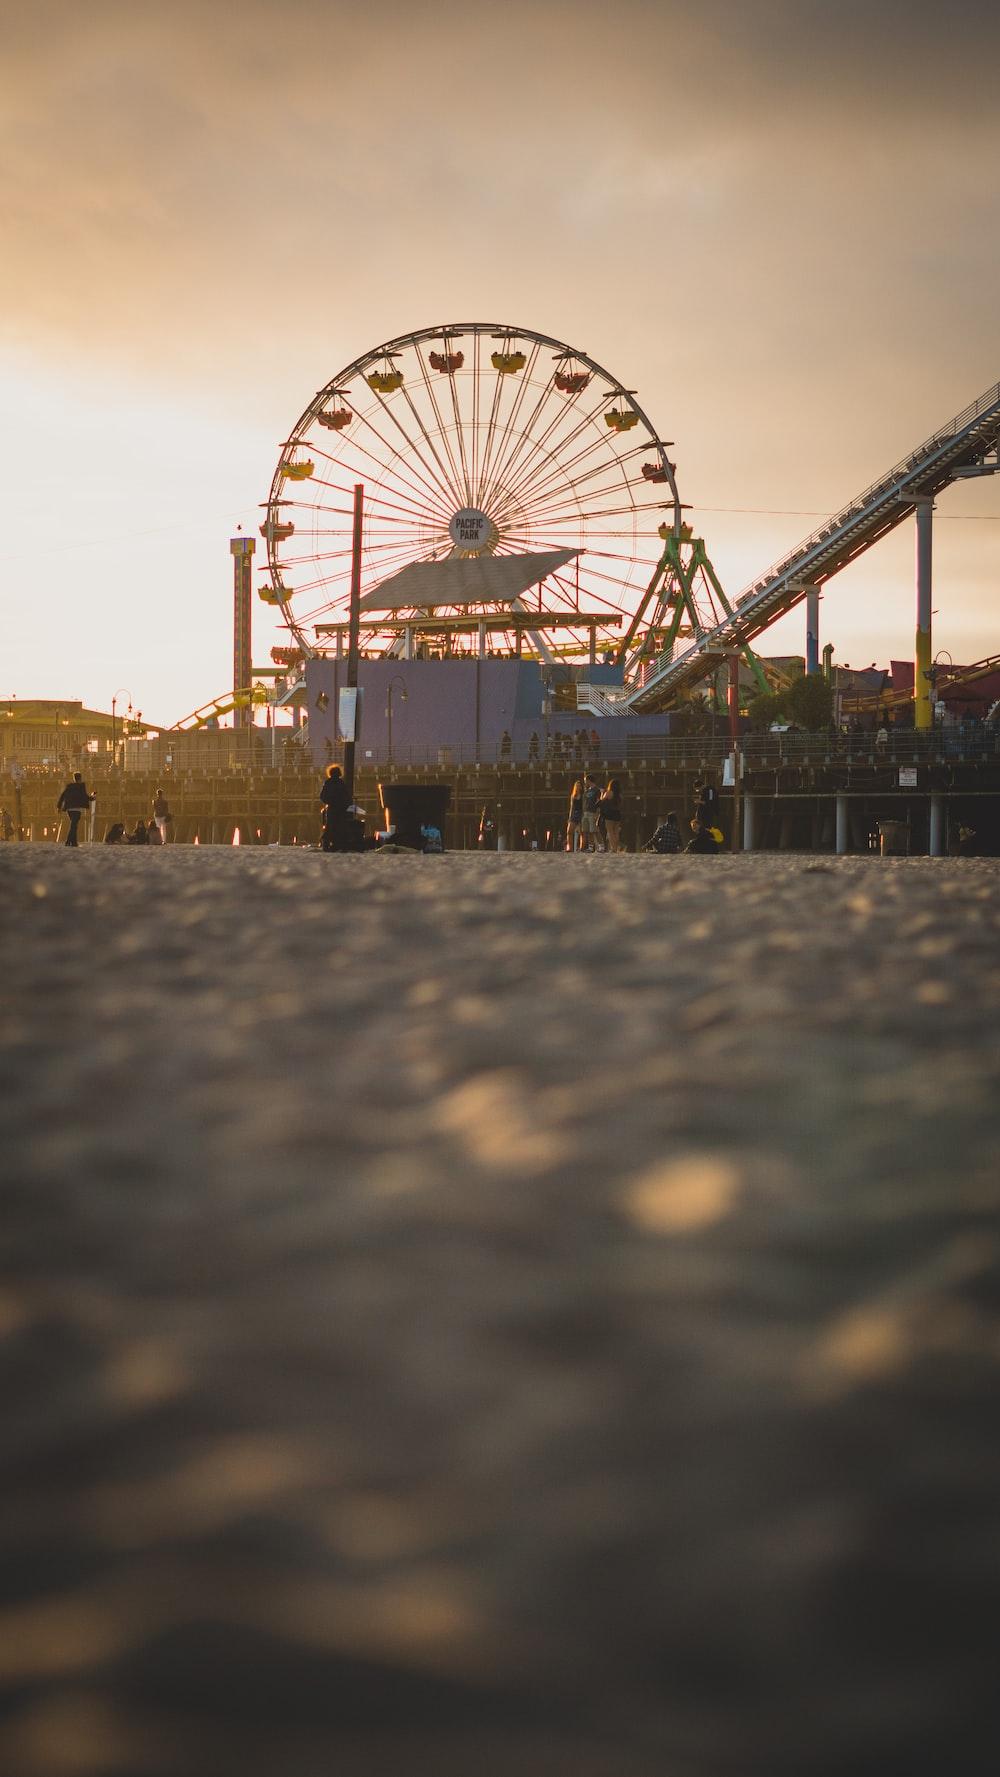 people walking on park during sunset